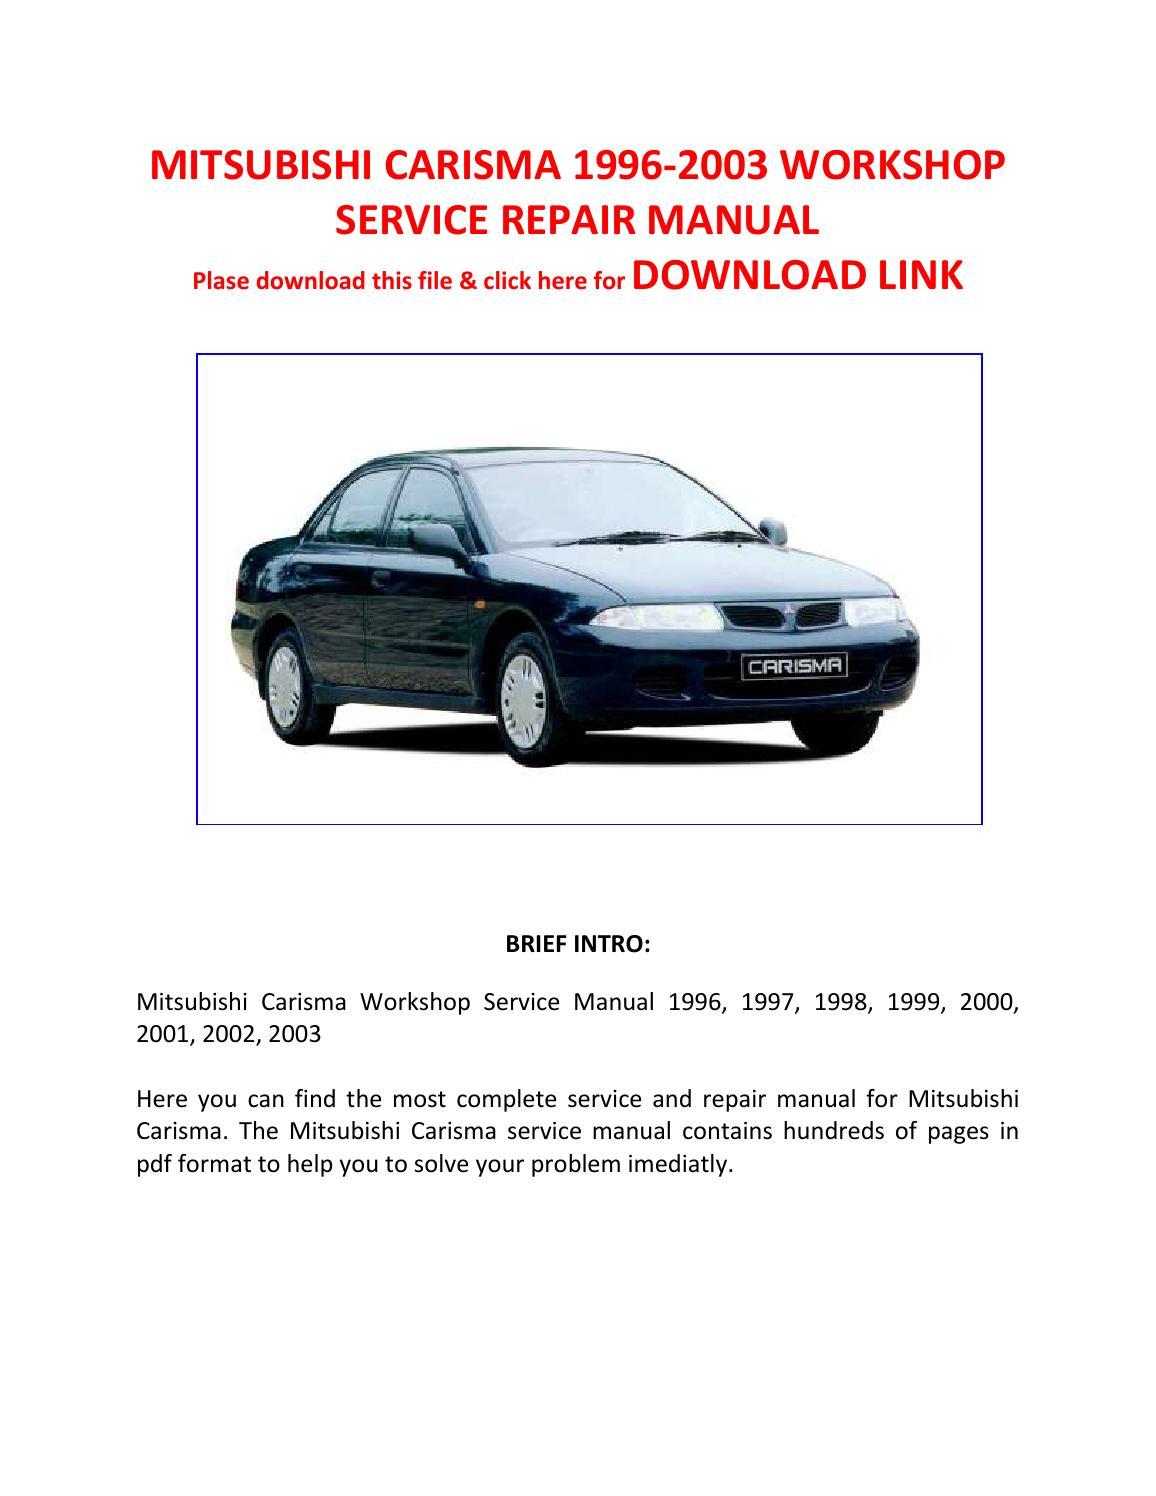 mitsubishi carisma 2002 repair service manual